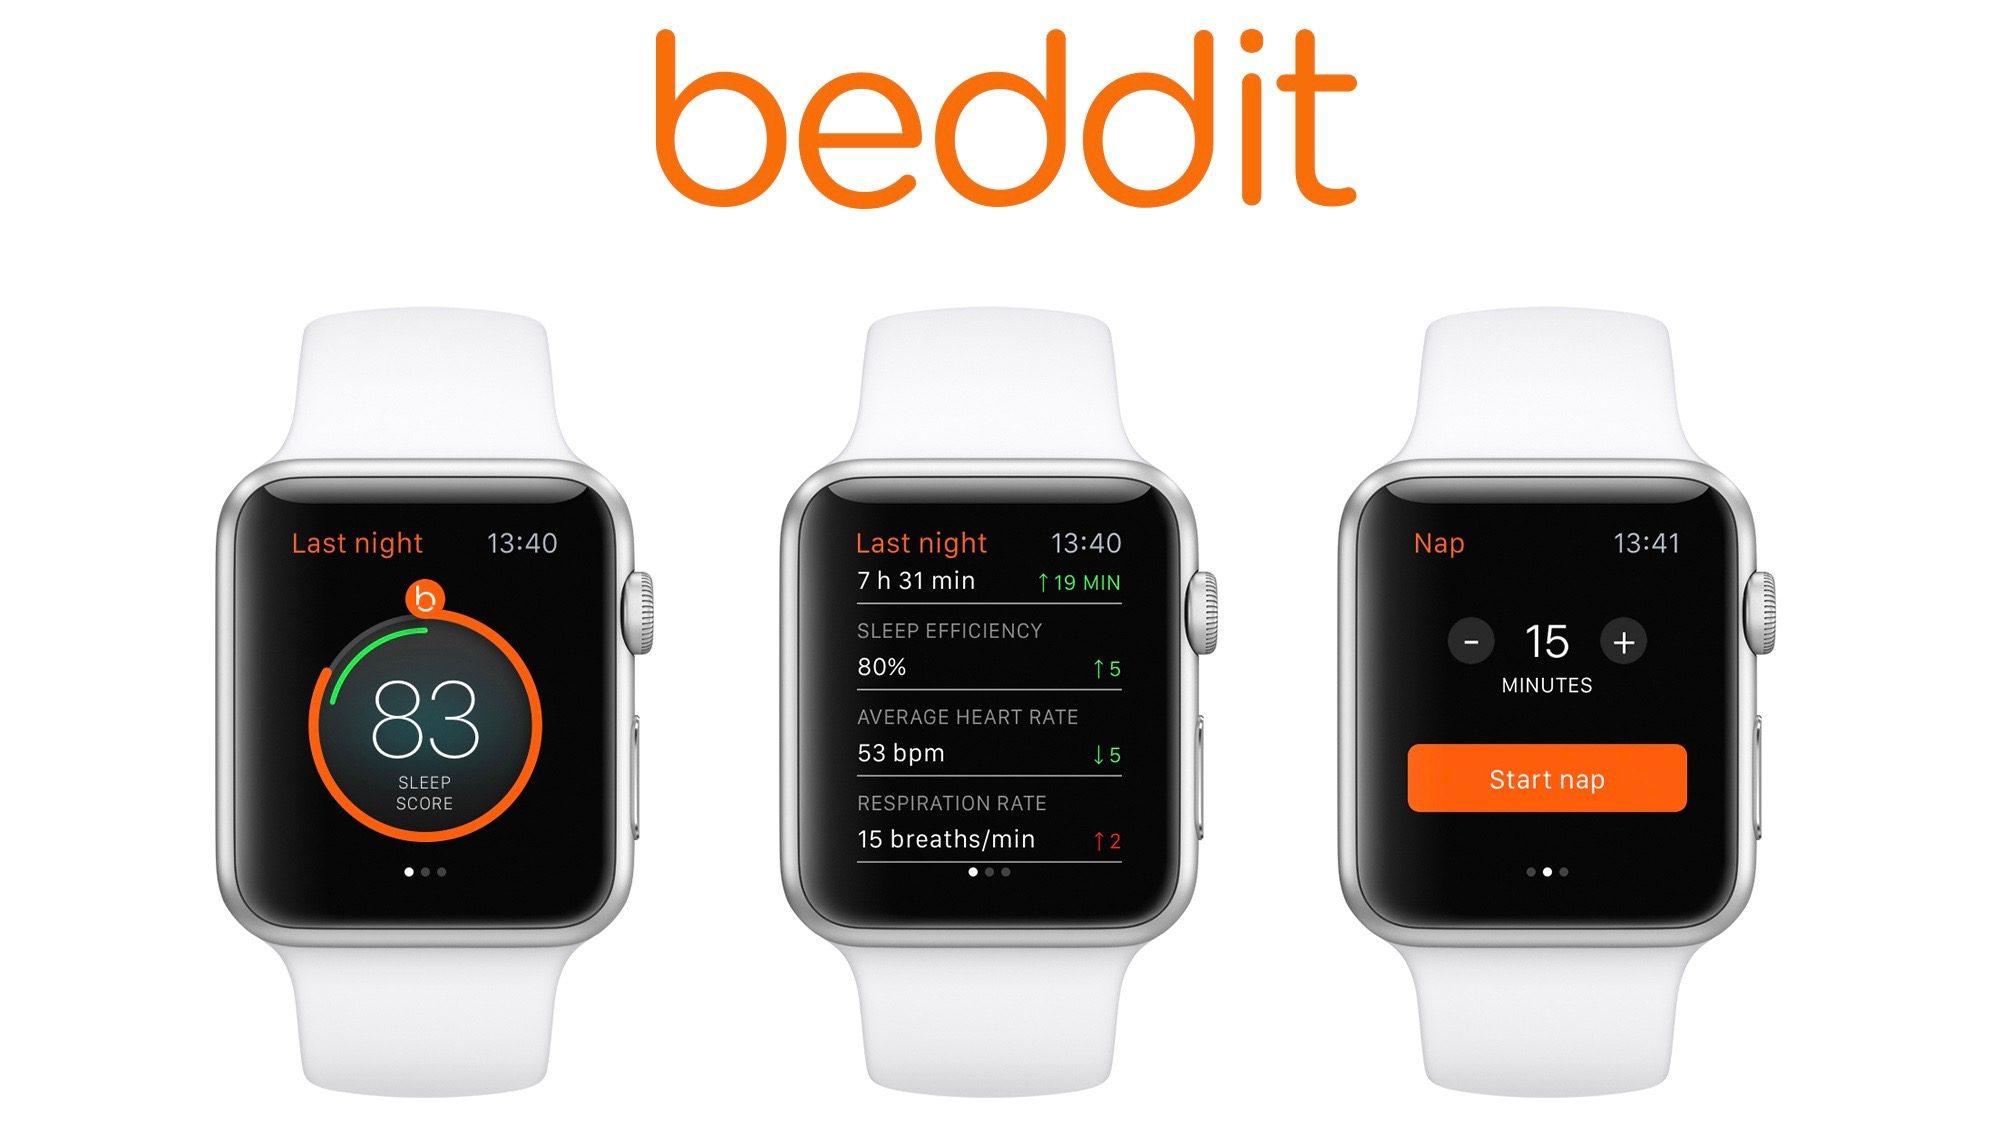 applewatch_beddit_app.jpg